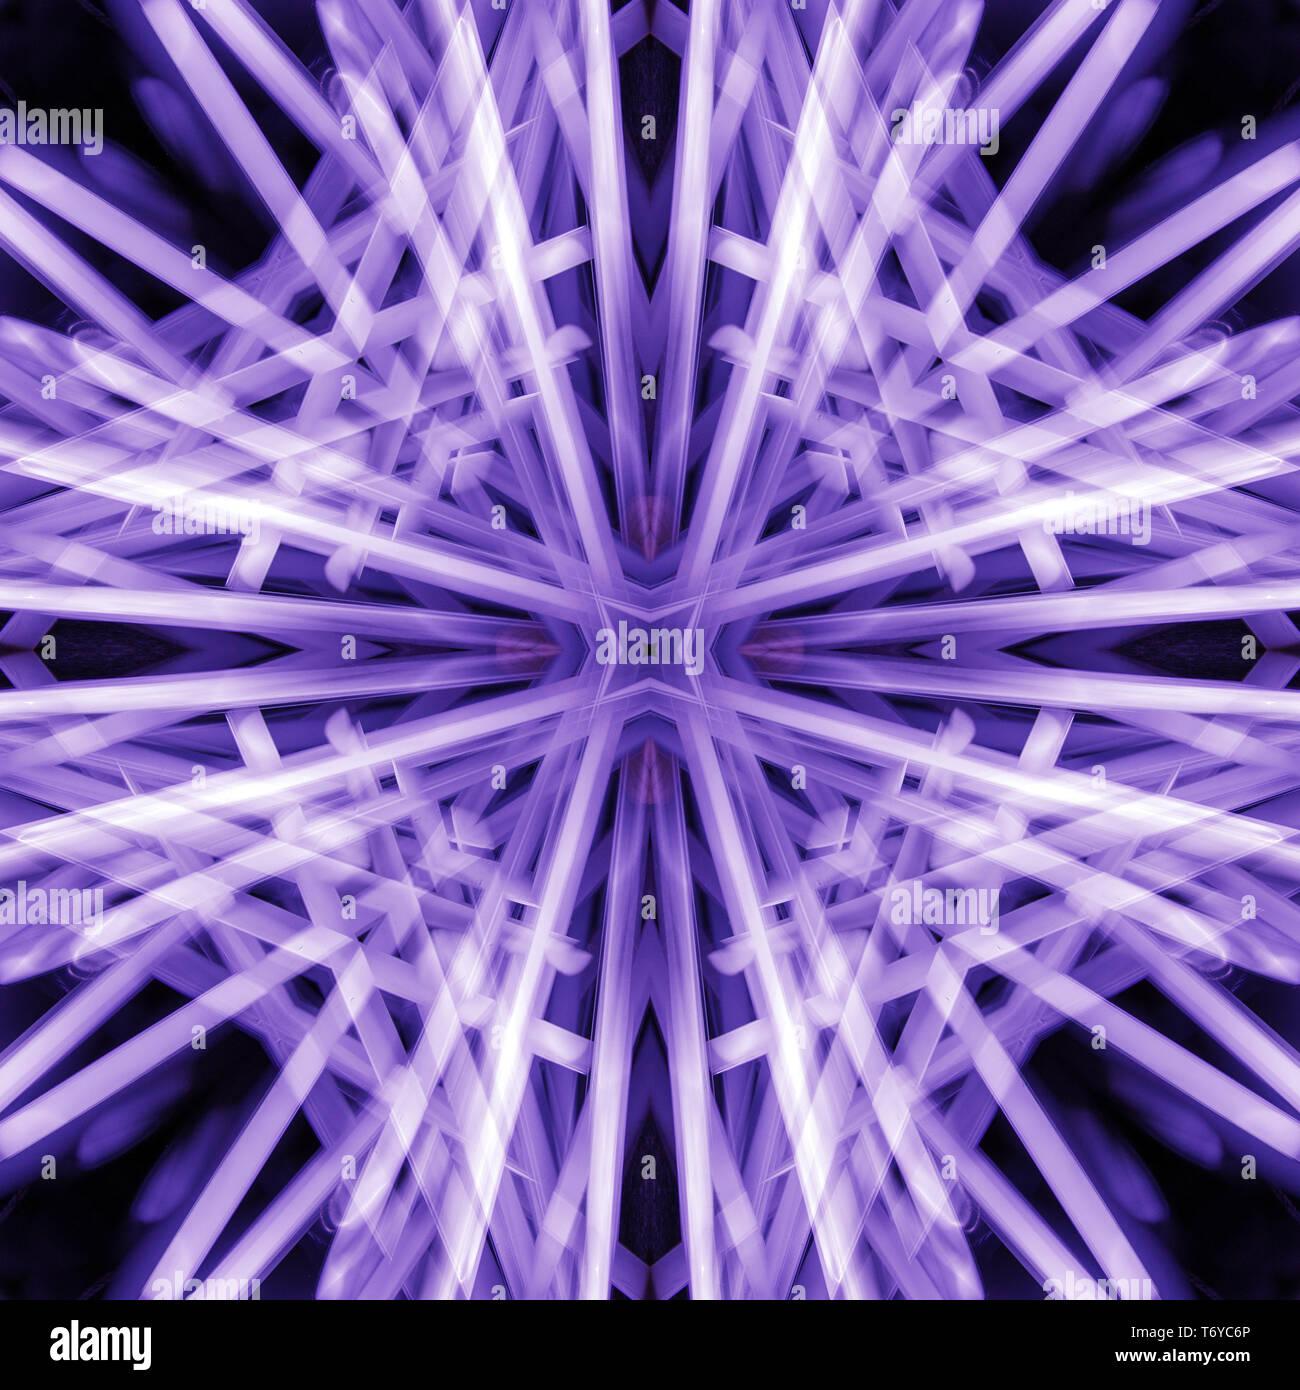 Arte patrón psicodélico. Resumen de antecedentes coloridos simétrico. Foto de stock